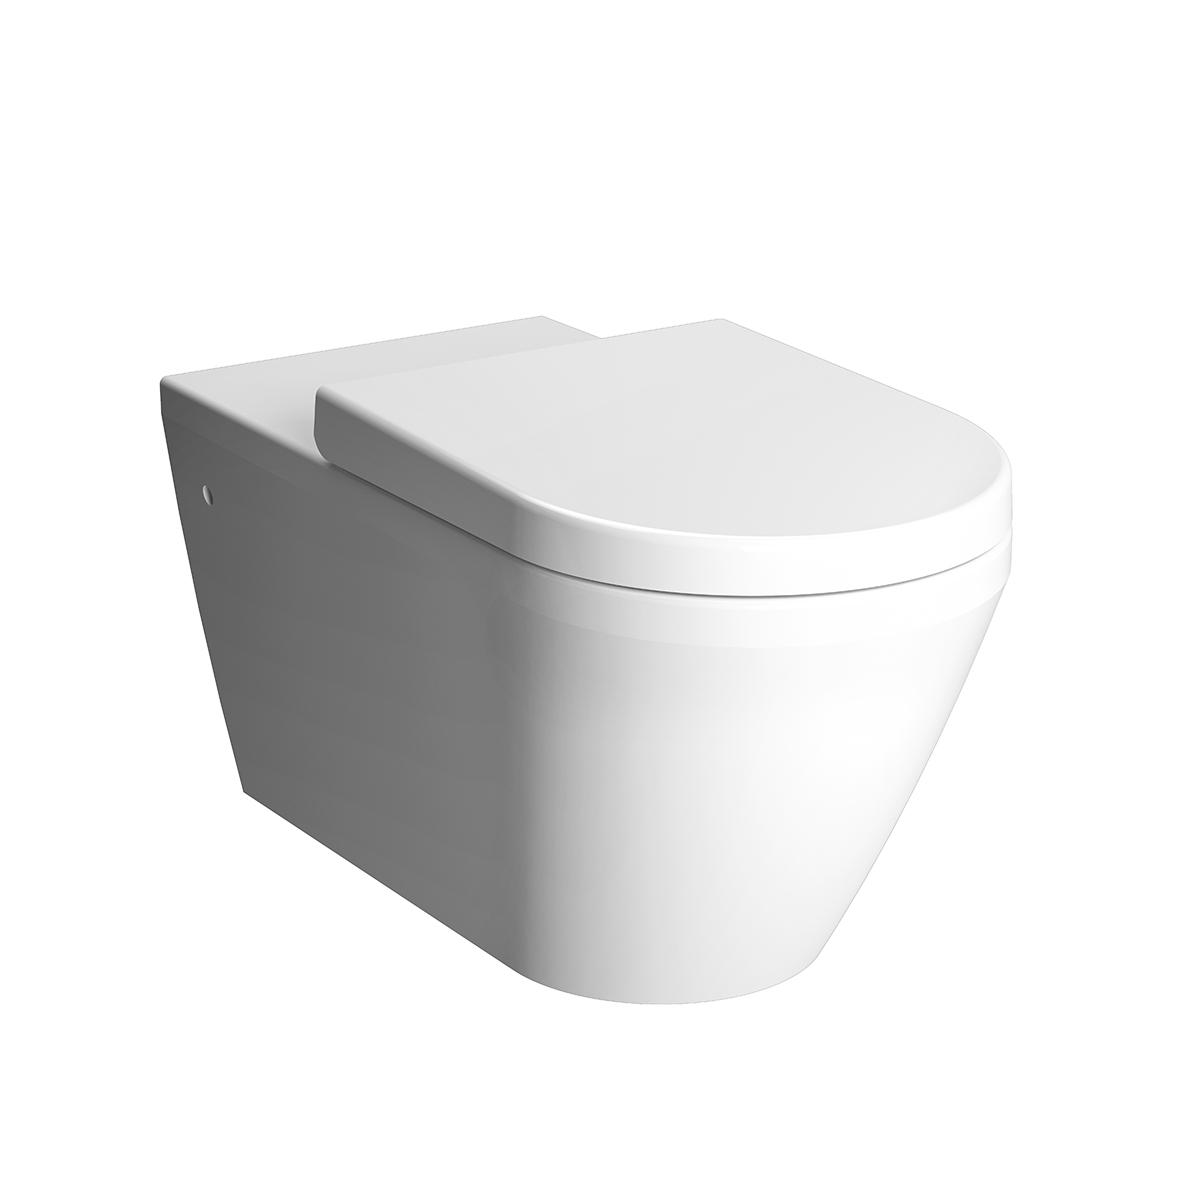 Integra WC suspendu sans bride, 70 cm, fonction bidet